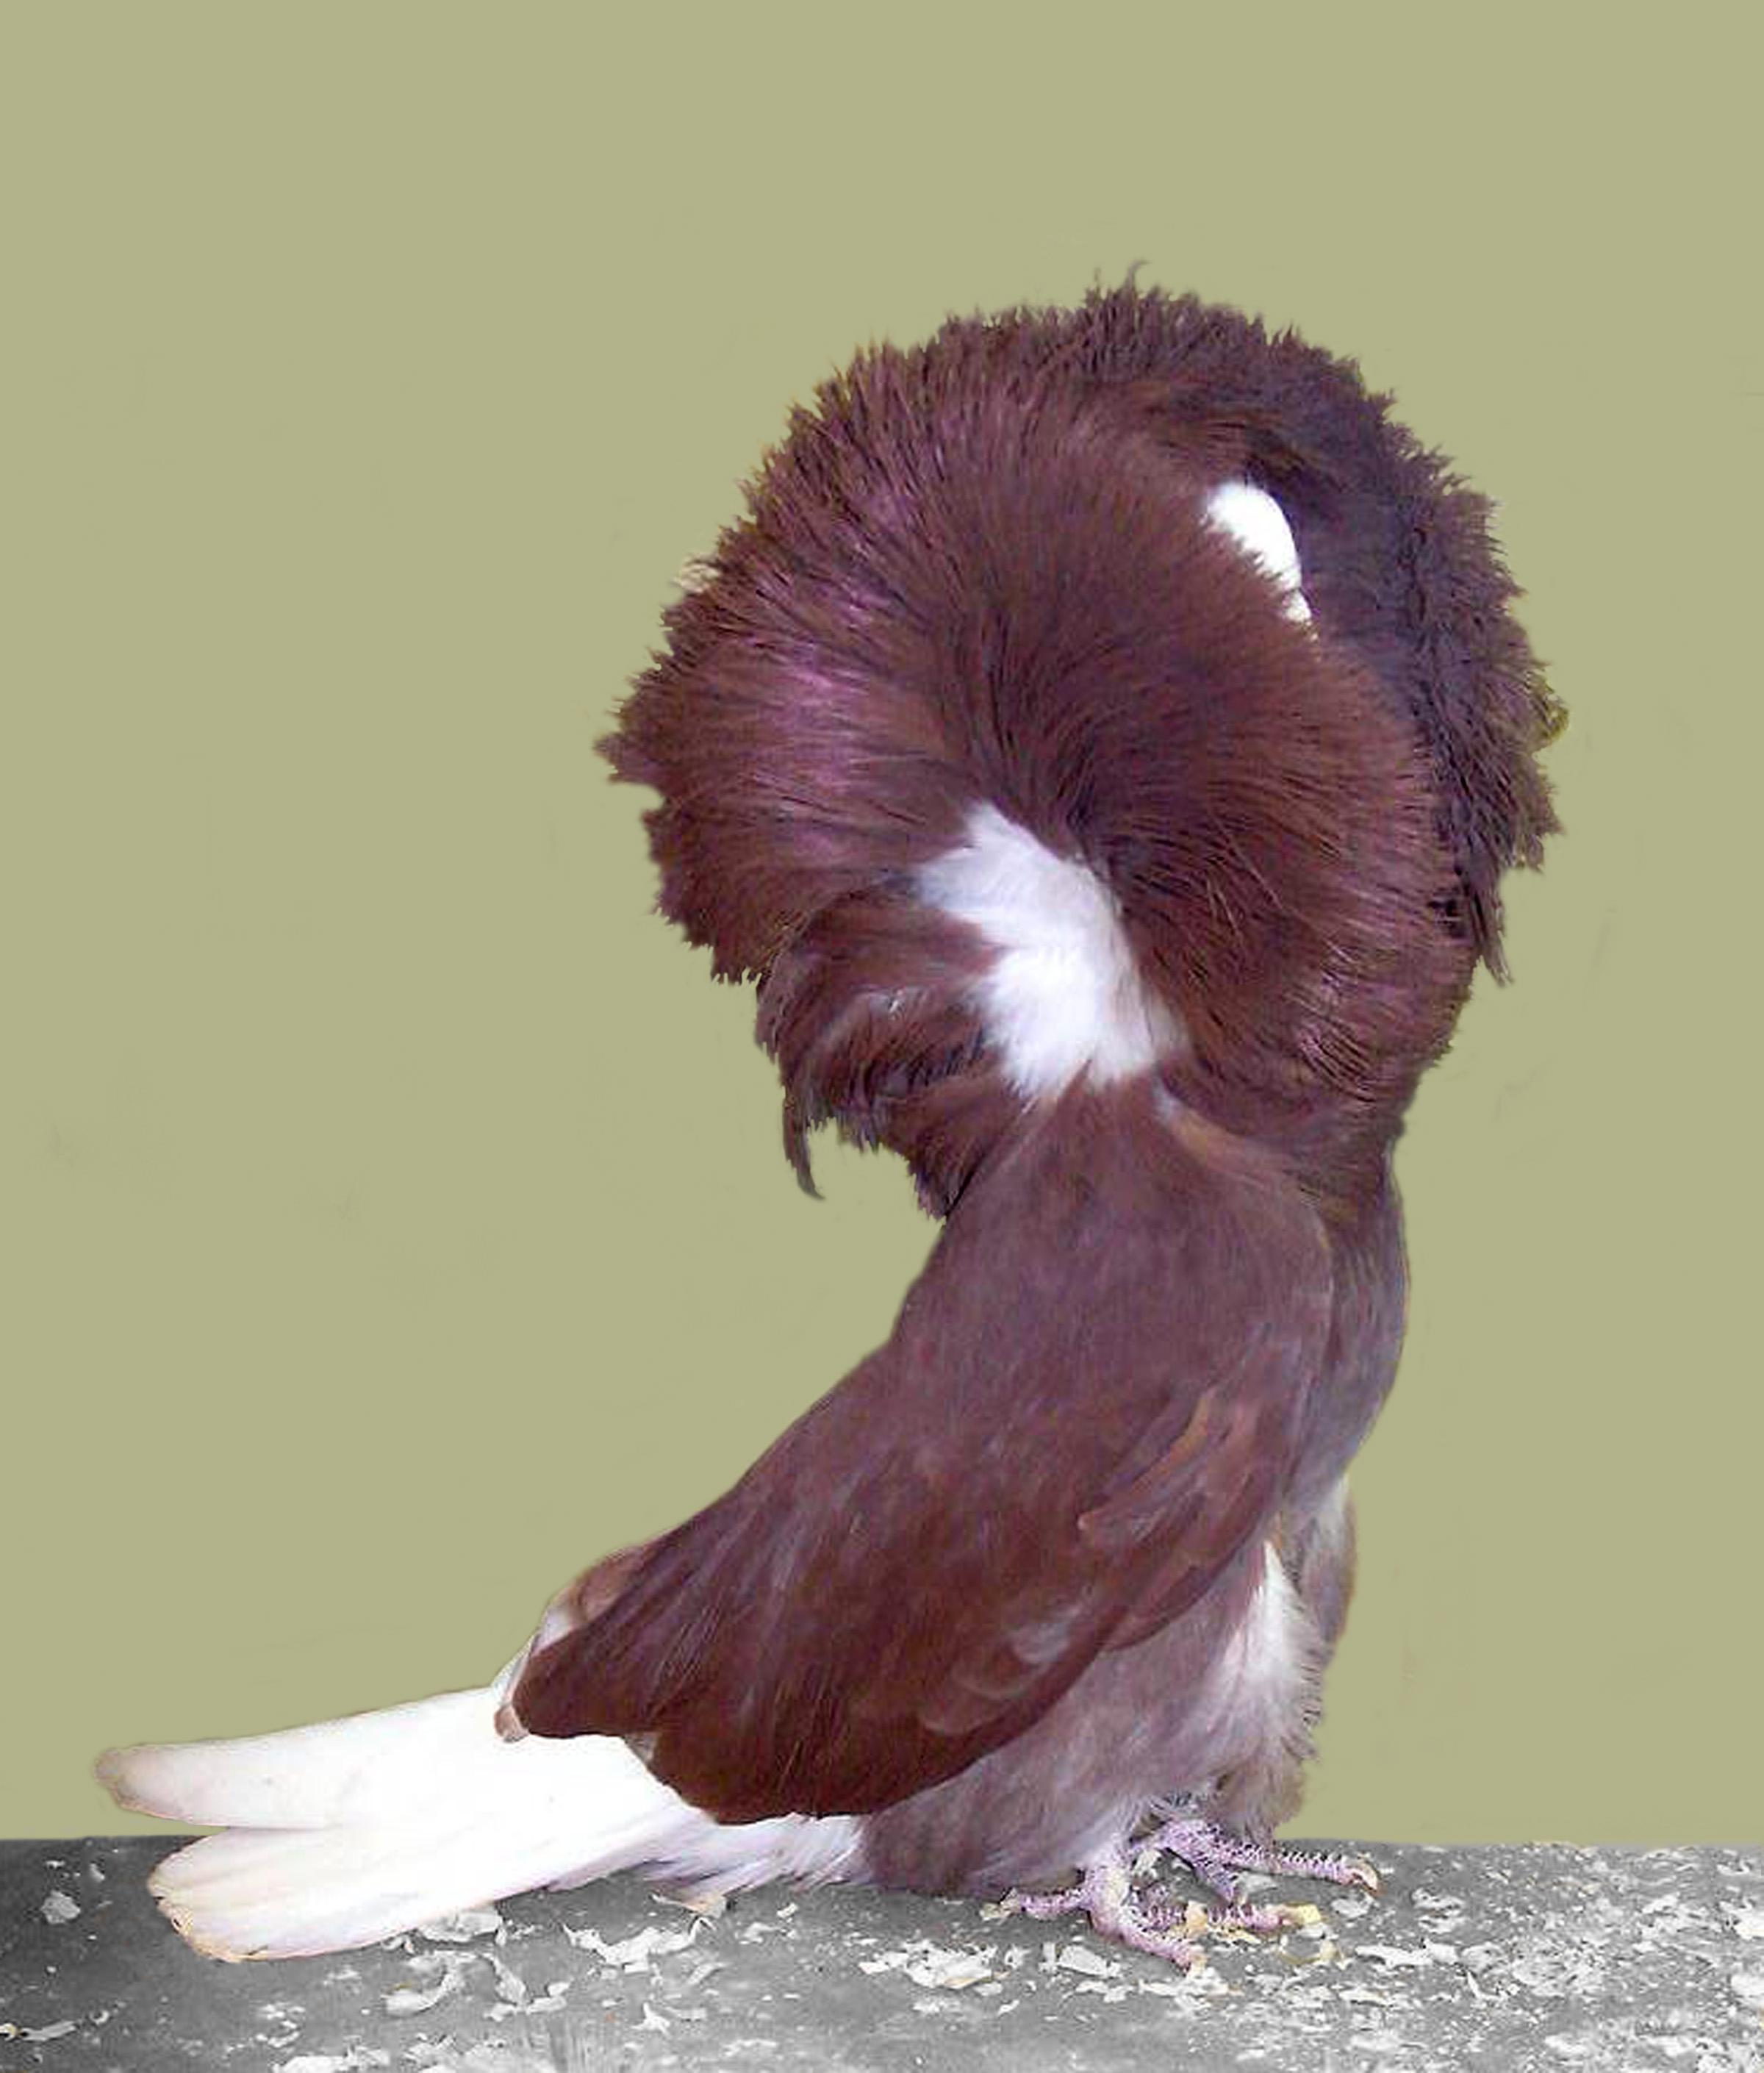 jacobin pigeon - photo #17